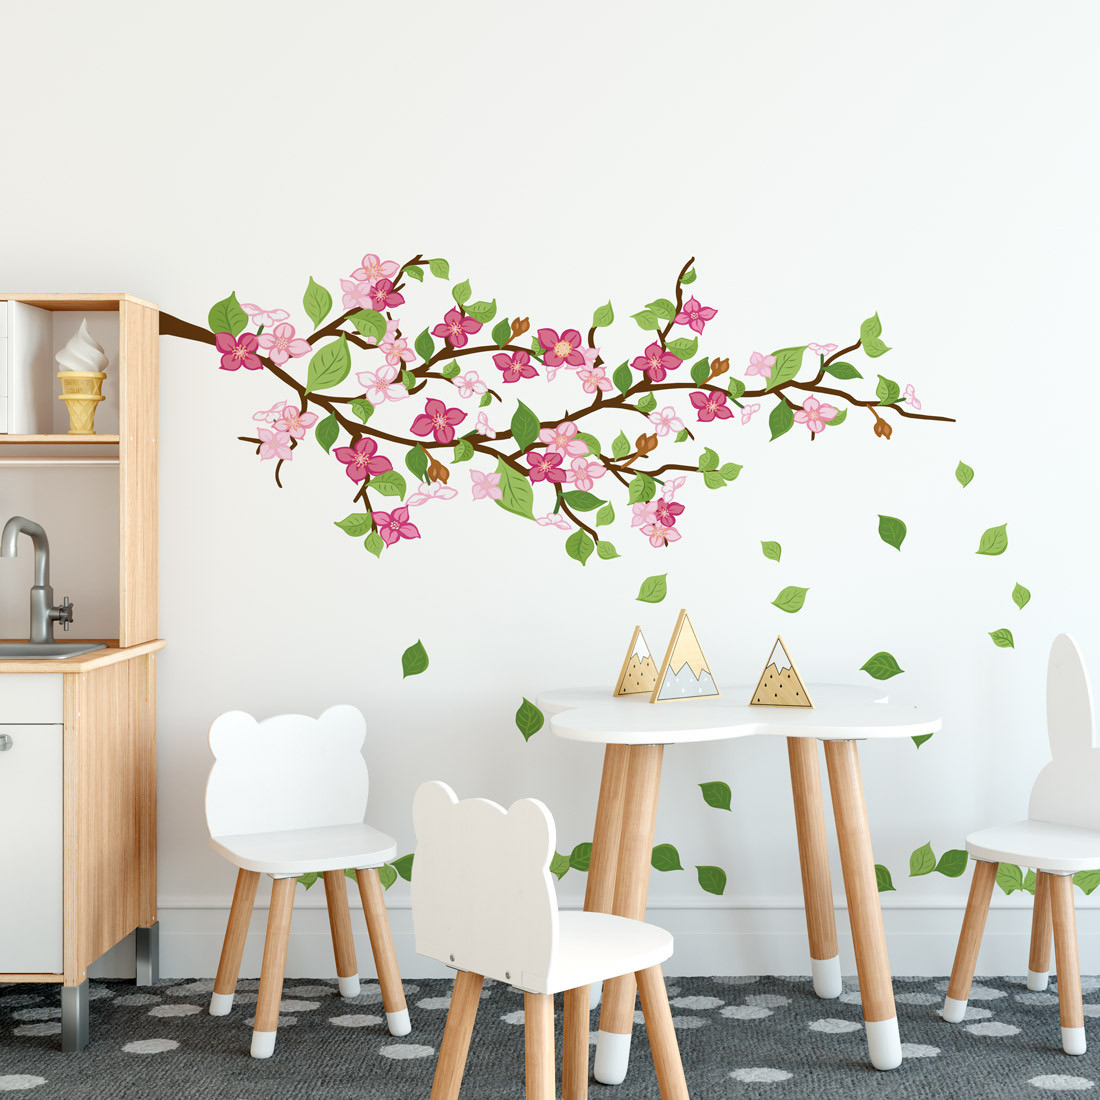 Adesivo de Parede Galho Floral Infantil Rosa